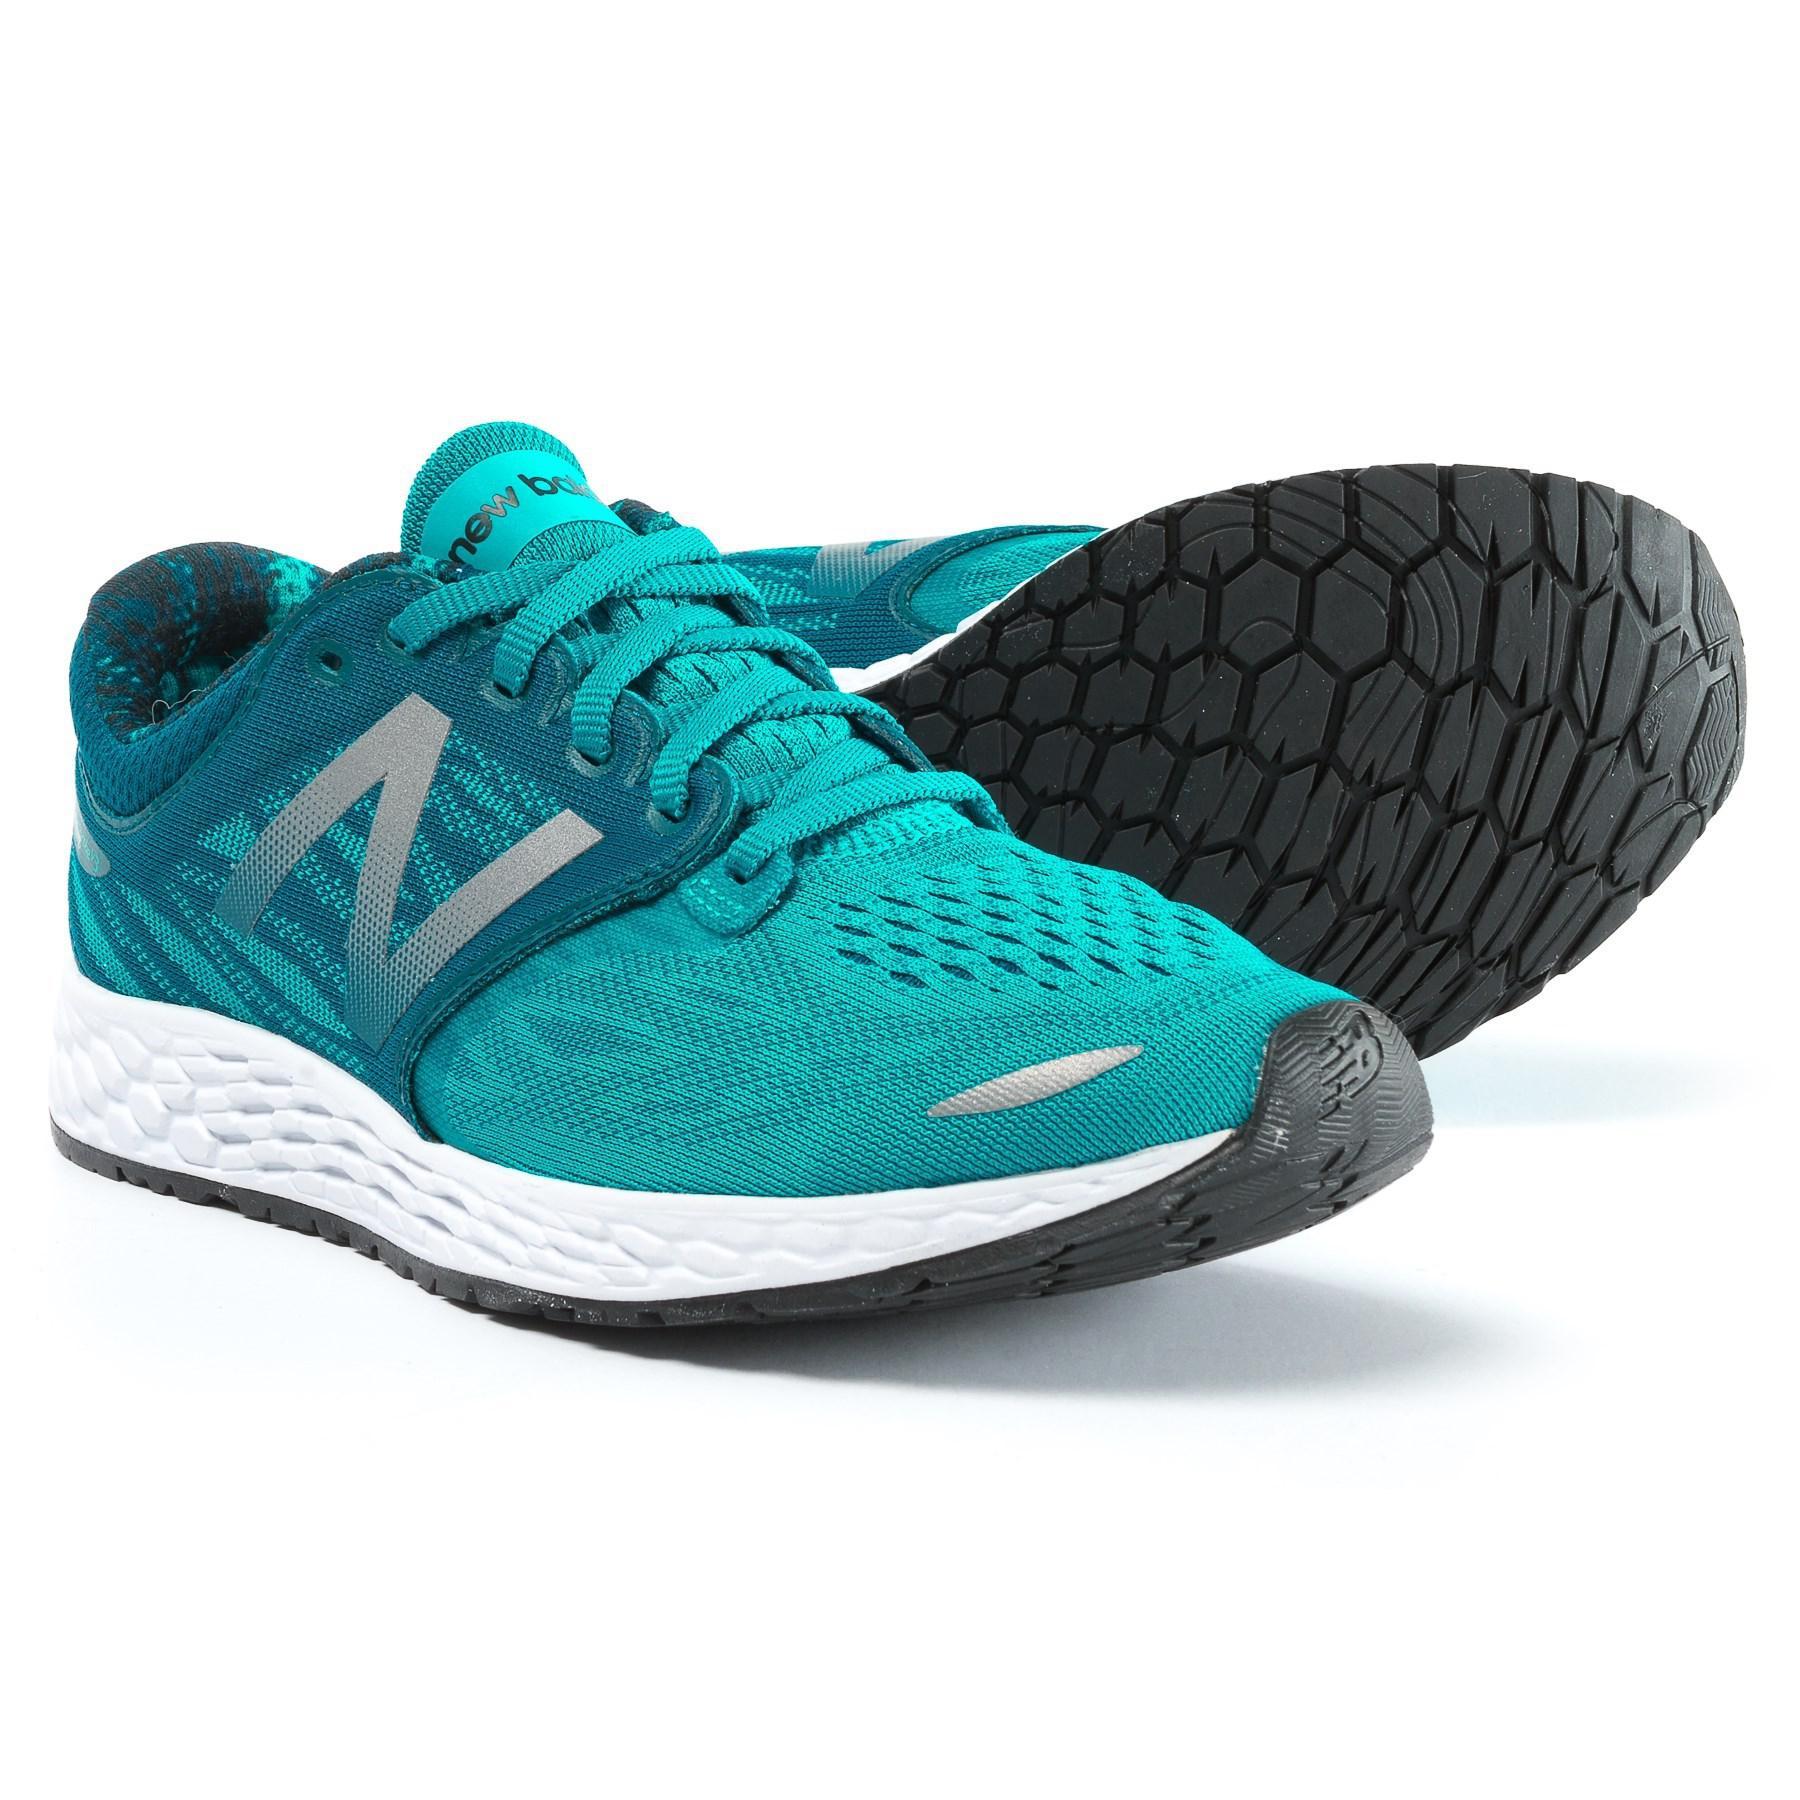 8853af296ca3 Lyst - New Balance Fresh Foam Zante V3 Ballpark Running Shoes (for ...